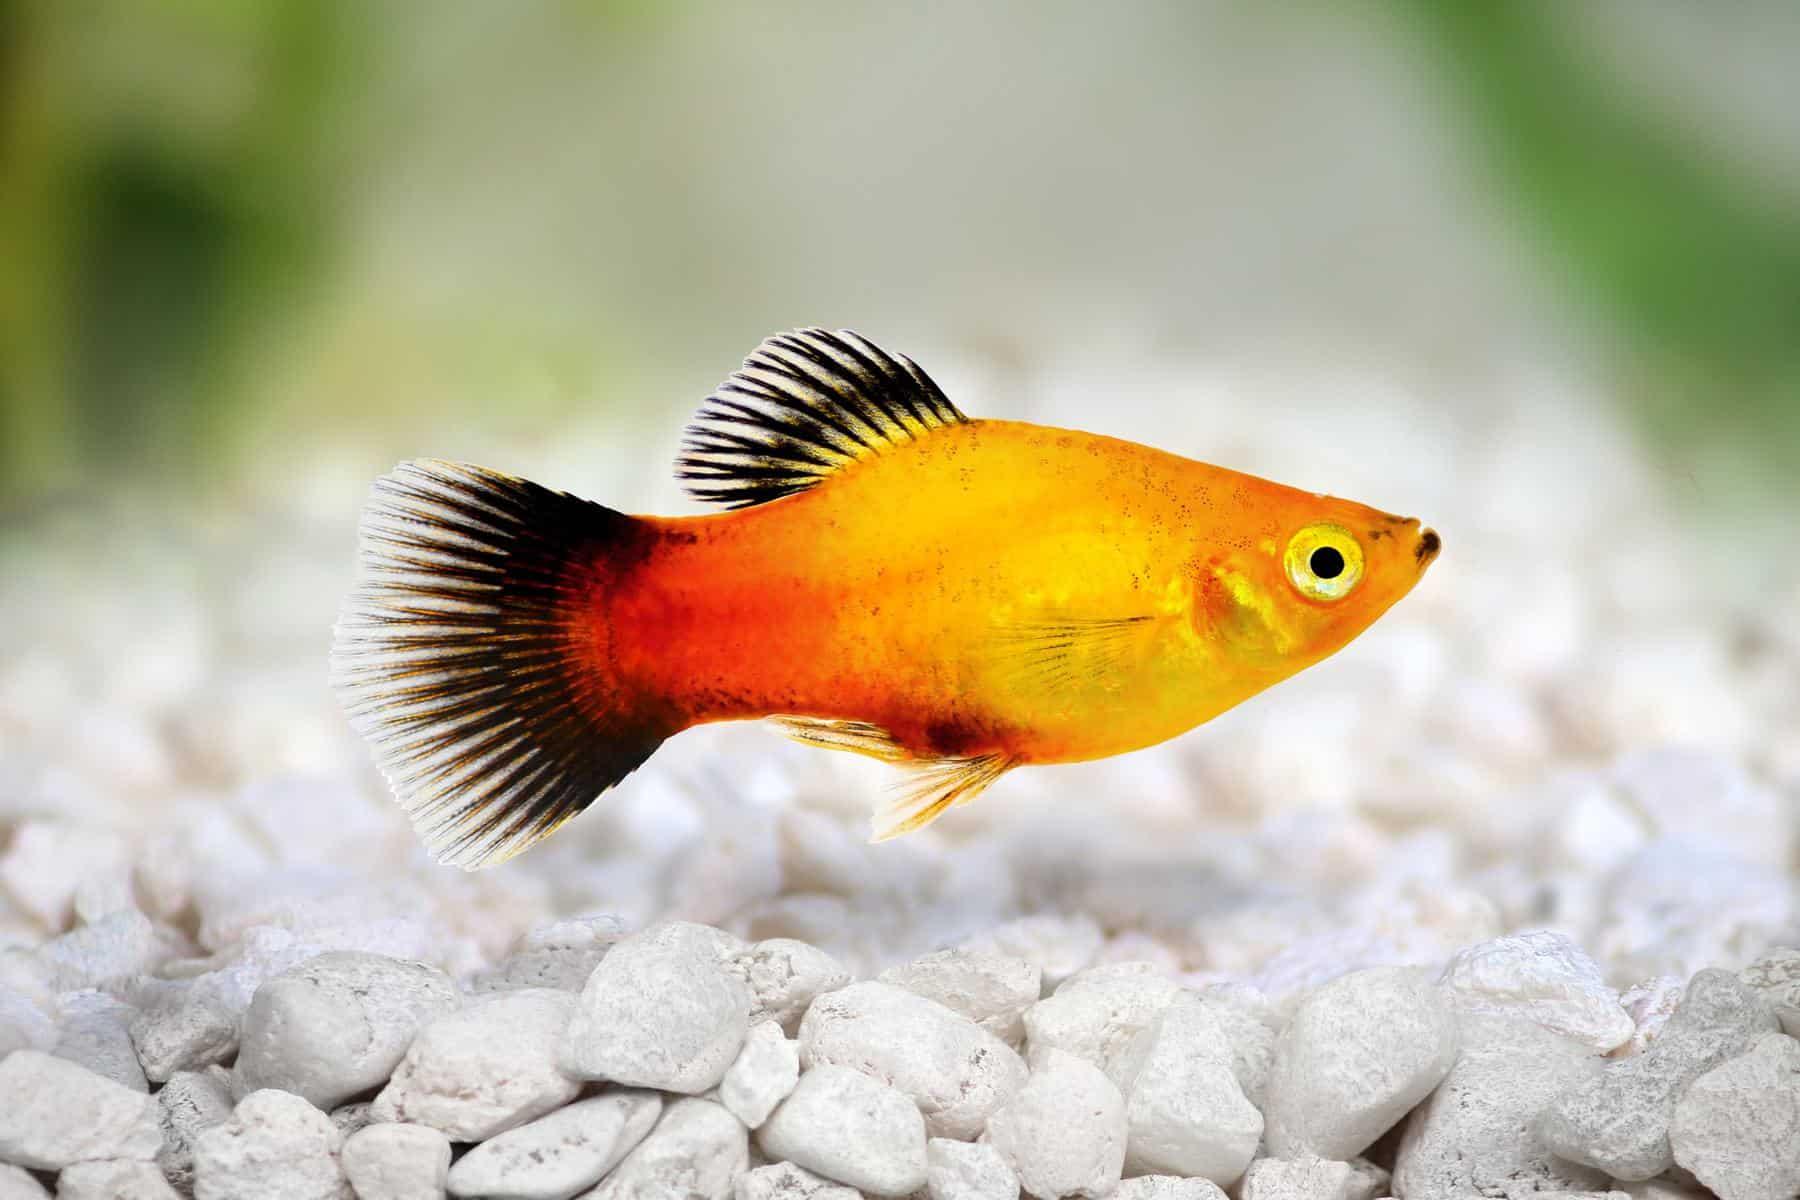 sunburst platy fish